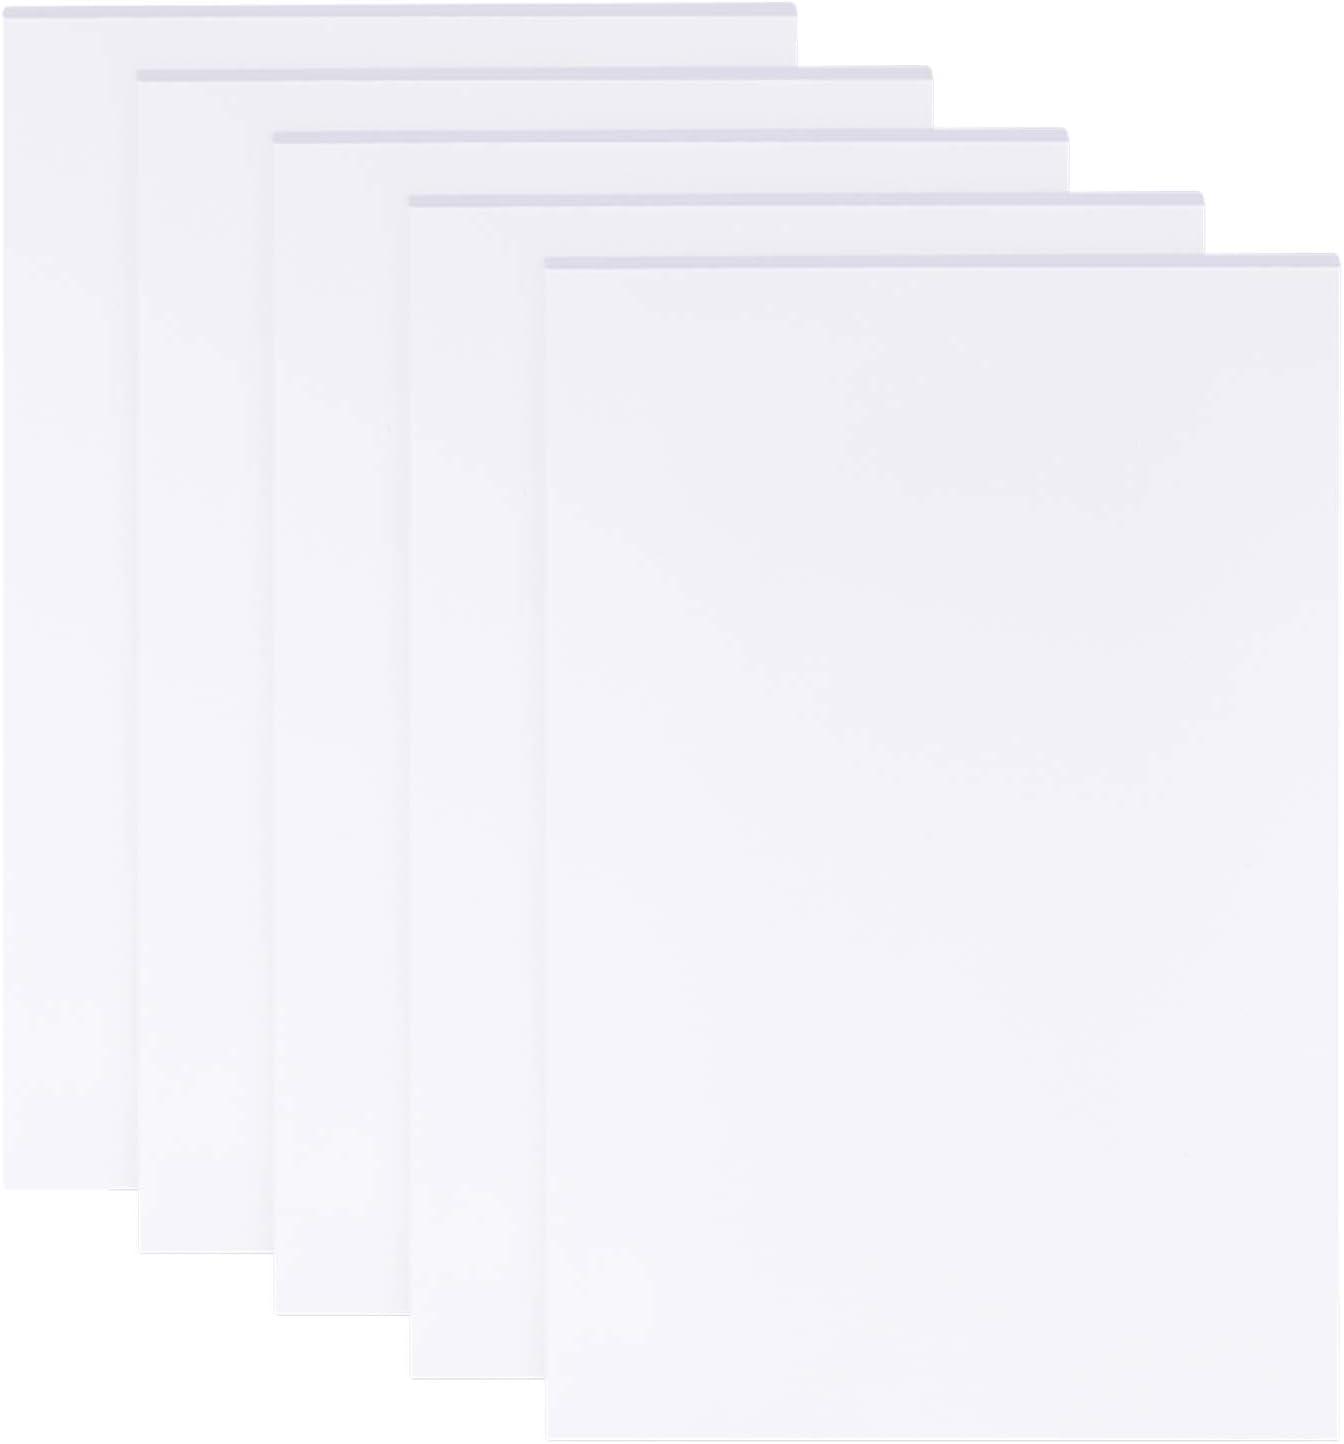 BENECREAT 5 Sheets 3mm White Boards 11.8x7.8